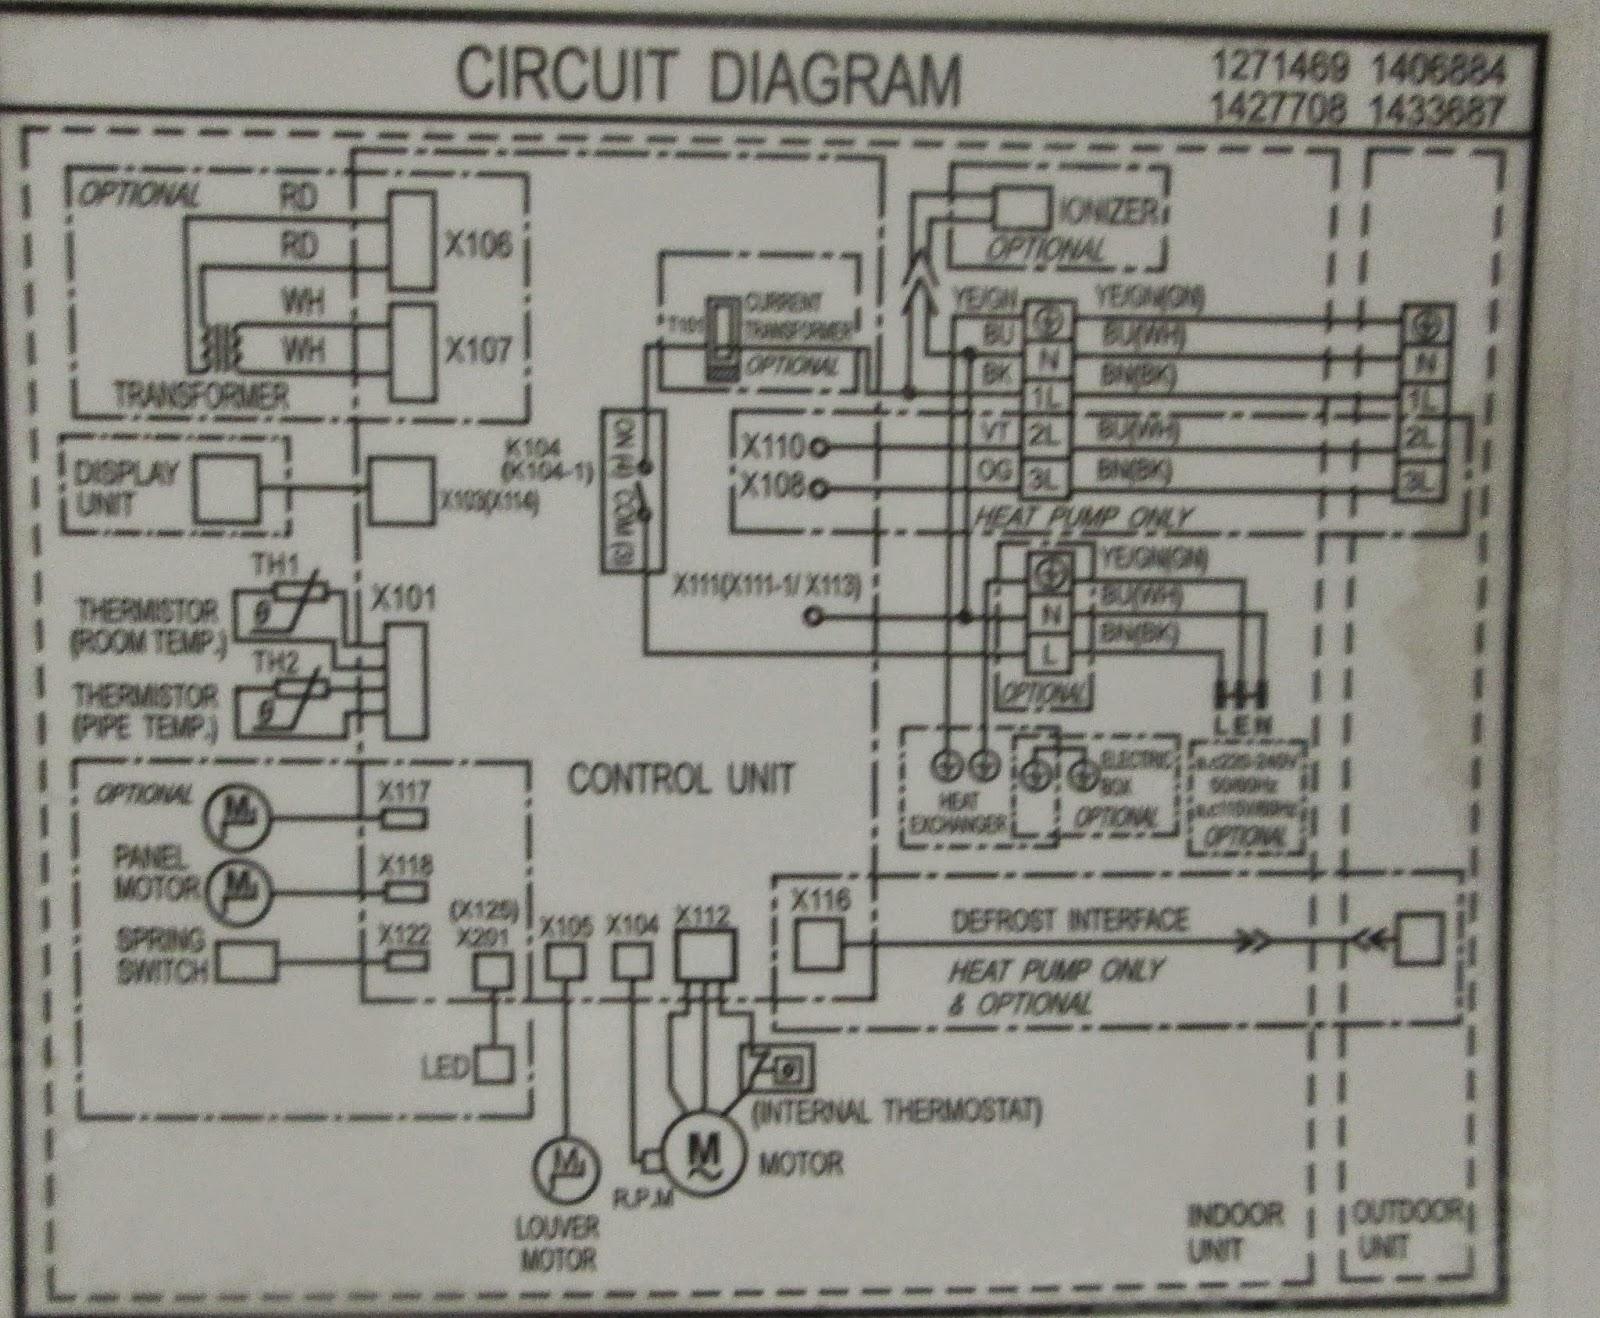 Wiring diagram kelistrikan ac split 123wiringdiagramine wiring diagram modul ac split wiring diagram with cheapraybanclubmaster Gallery